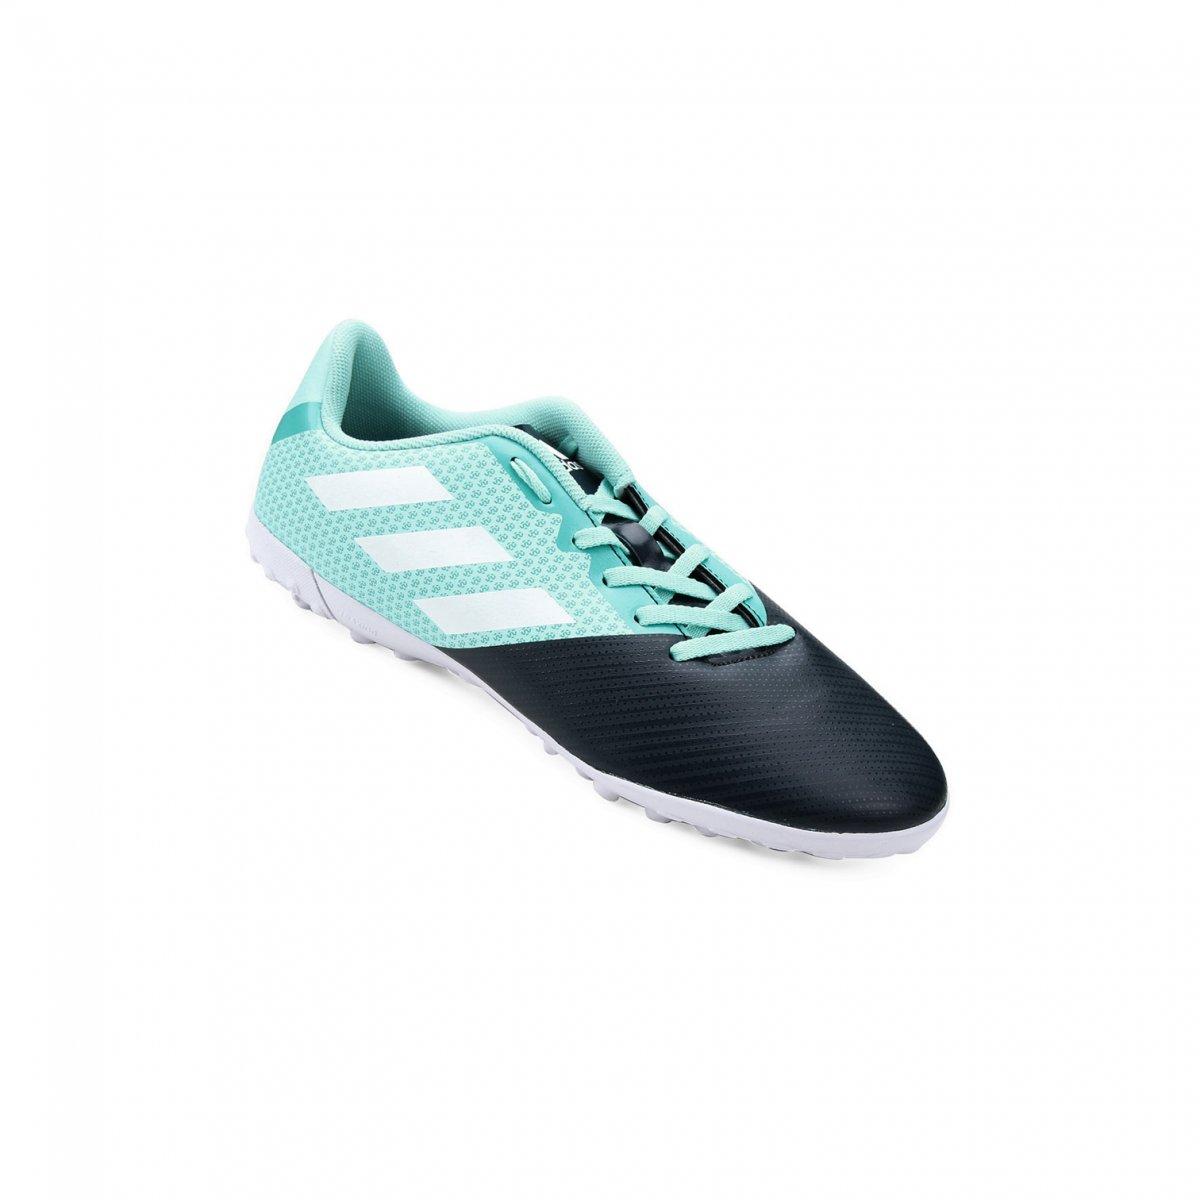 Chuteira Infantil Society Adidas Artilheira II TF H68491 Preto Azul 2e4ffa9877975